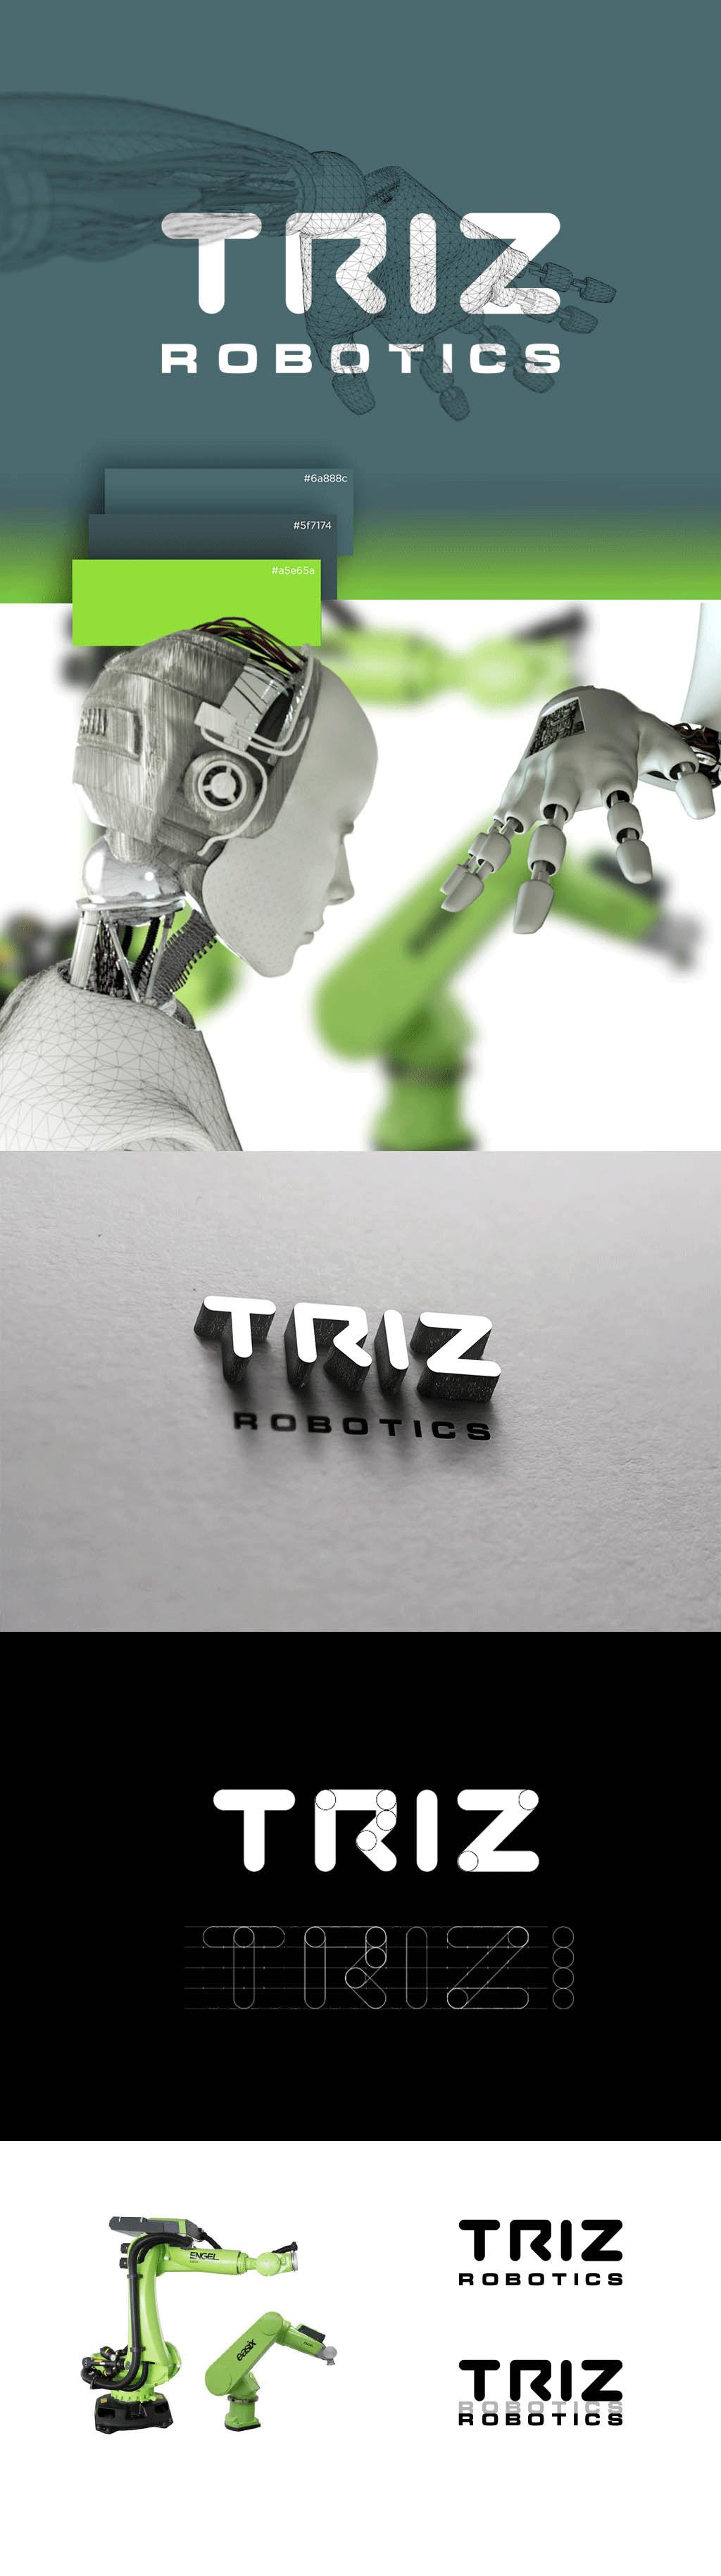 TRIZ-ROBOTICS